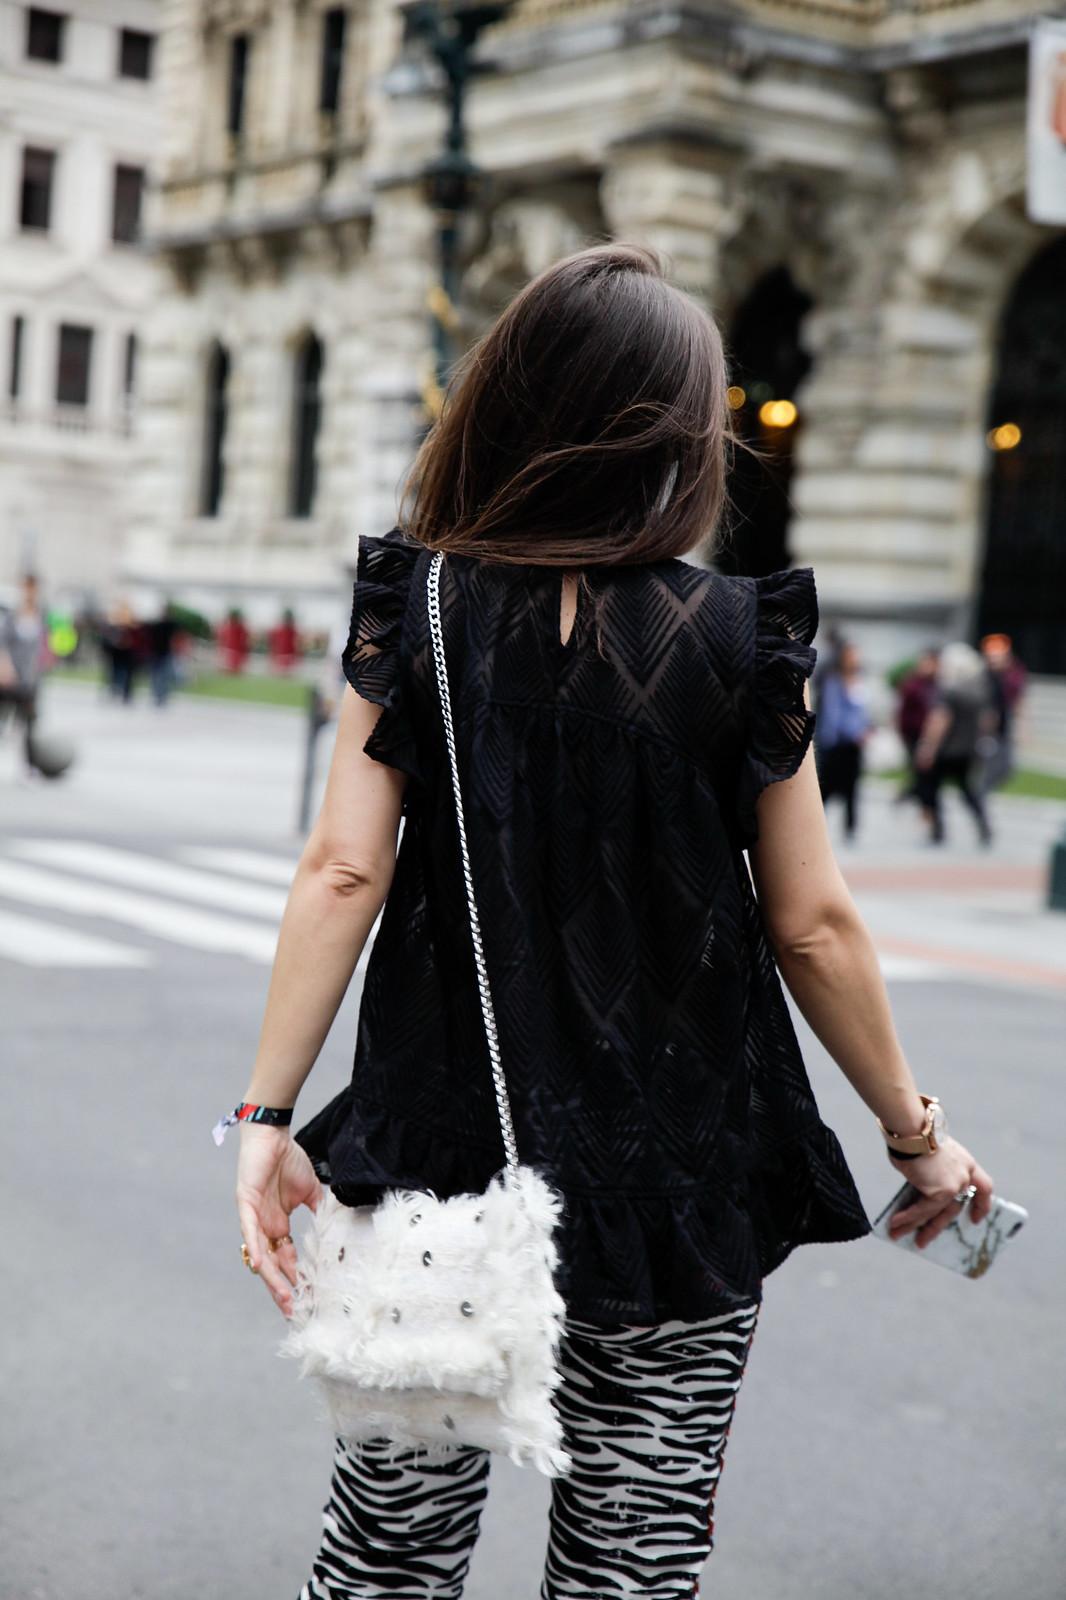 011_Pantalones_Zebra_Blusa_Boho_tacones_rosas_stradivarius_Theguestgirl_outfit_barcelona_streetstyle